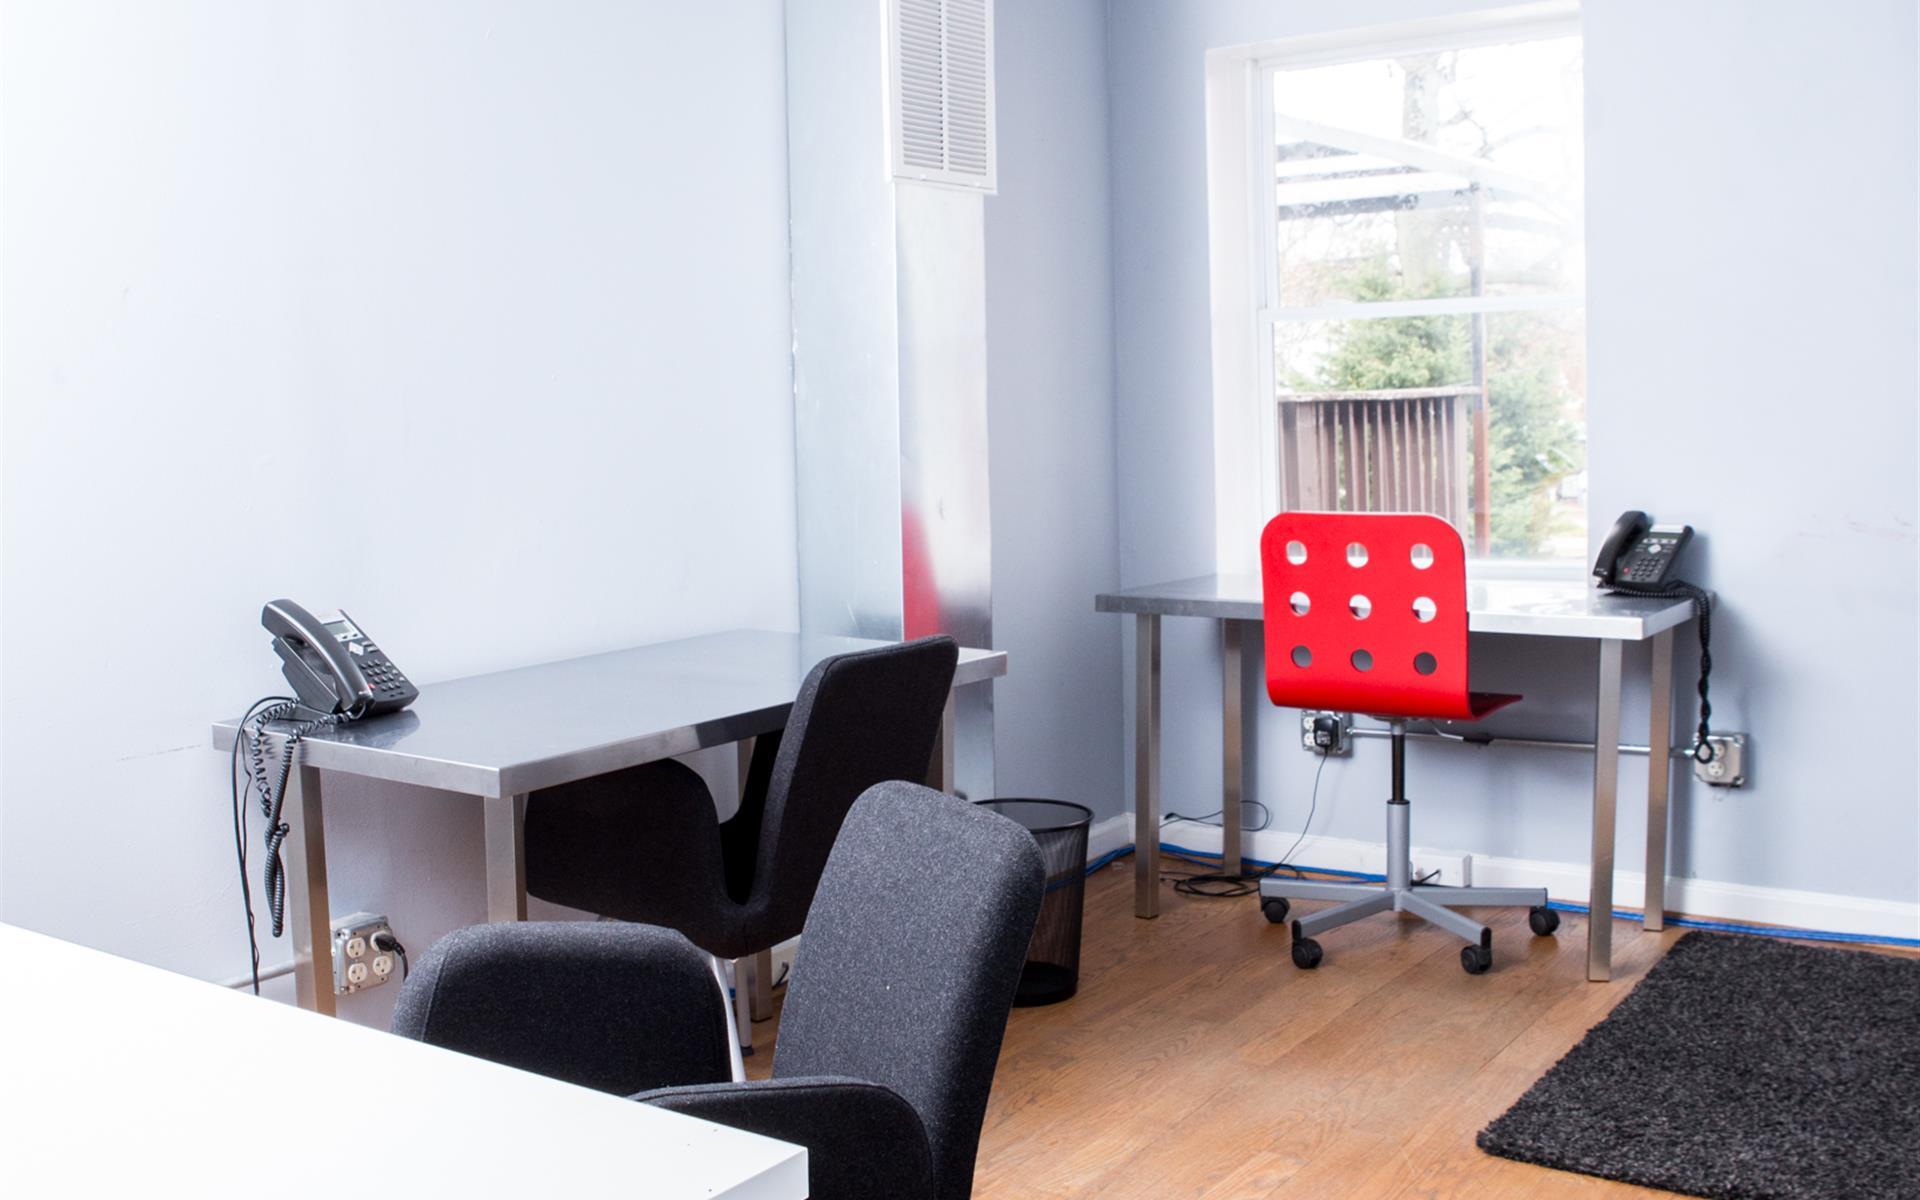 Flex Office Space - Dedicated Desk